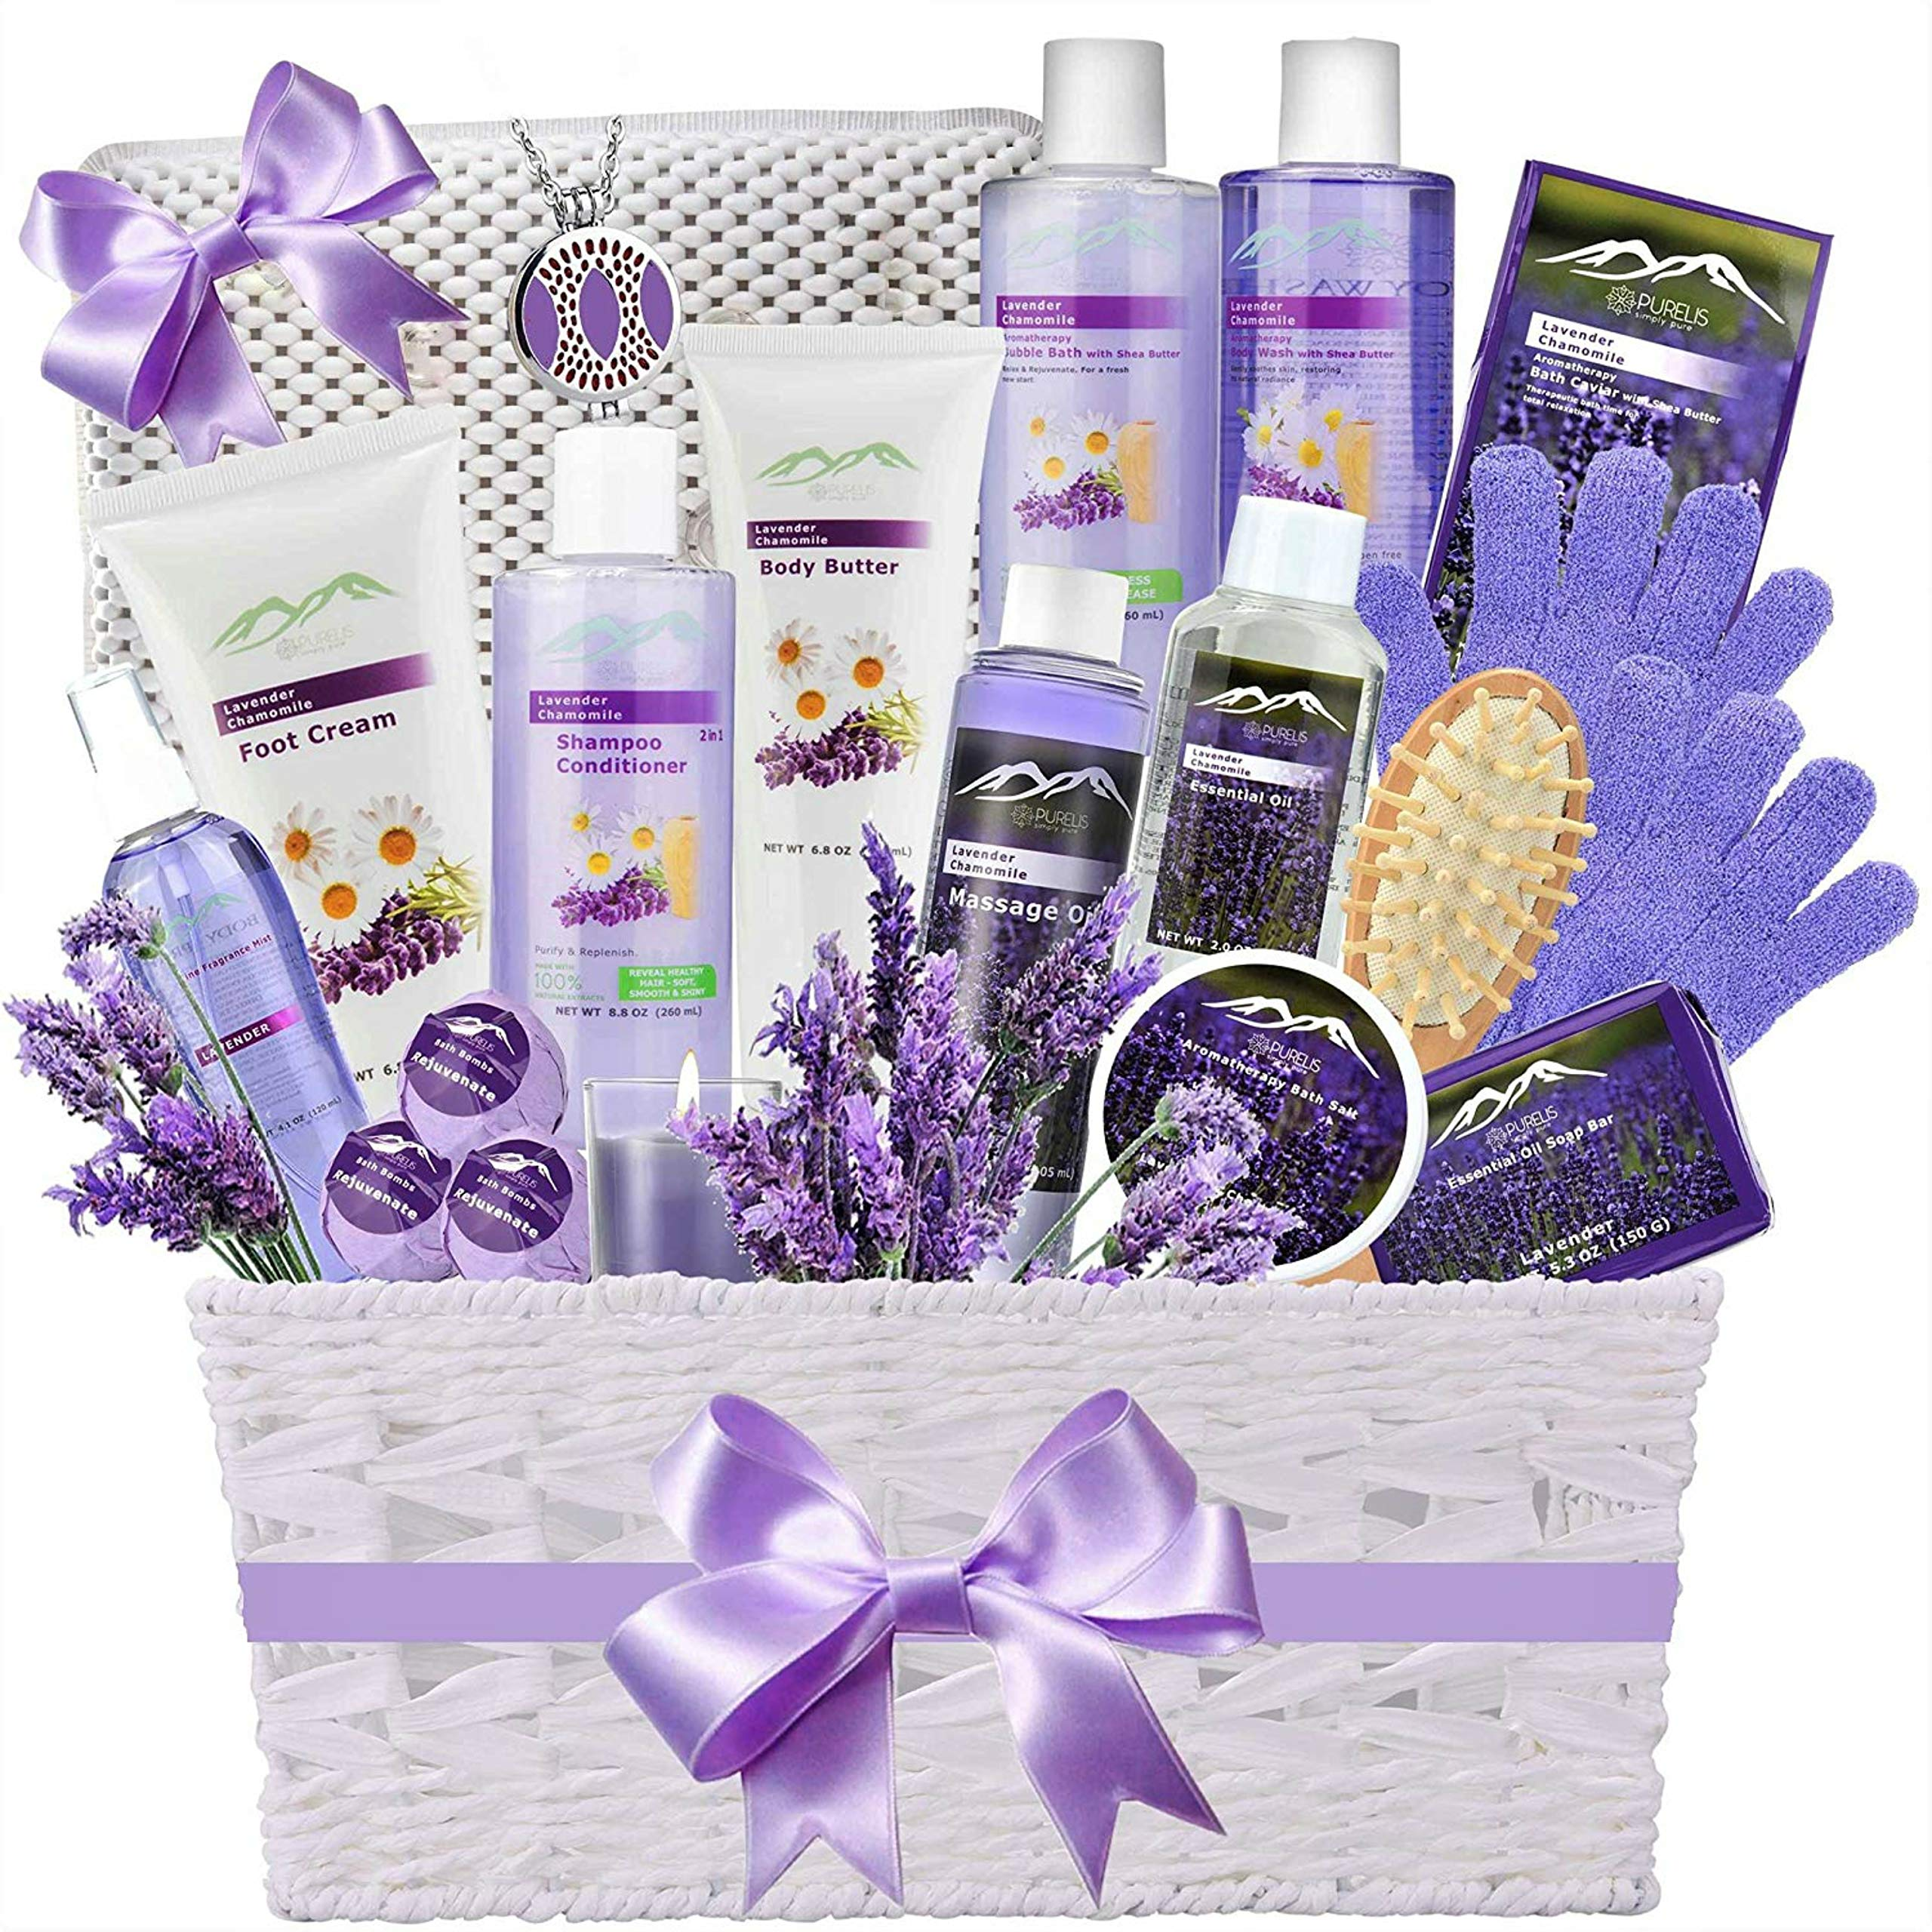 Premium Deluxe Bath & Body Gift Basket. Ultimate Large Spa Basket! #1 Spa Gift Basket for Women- Deluxe Aromatherapy Lavender Spa Kit + Luxury Bath Pillow! by Purelis